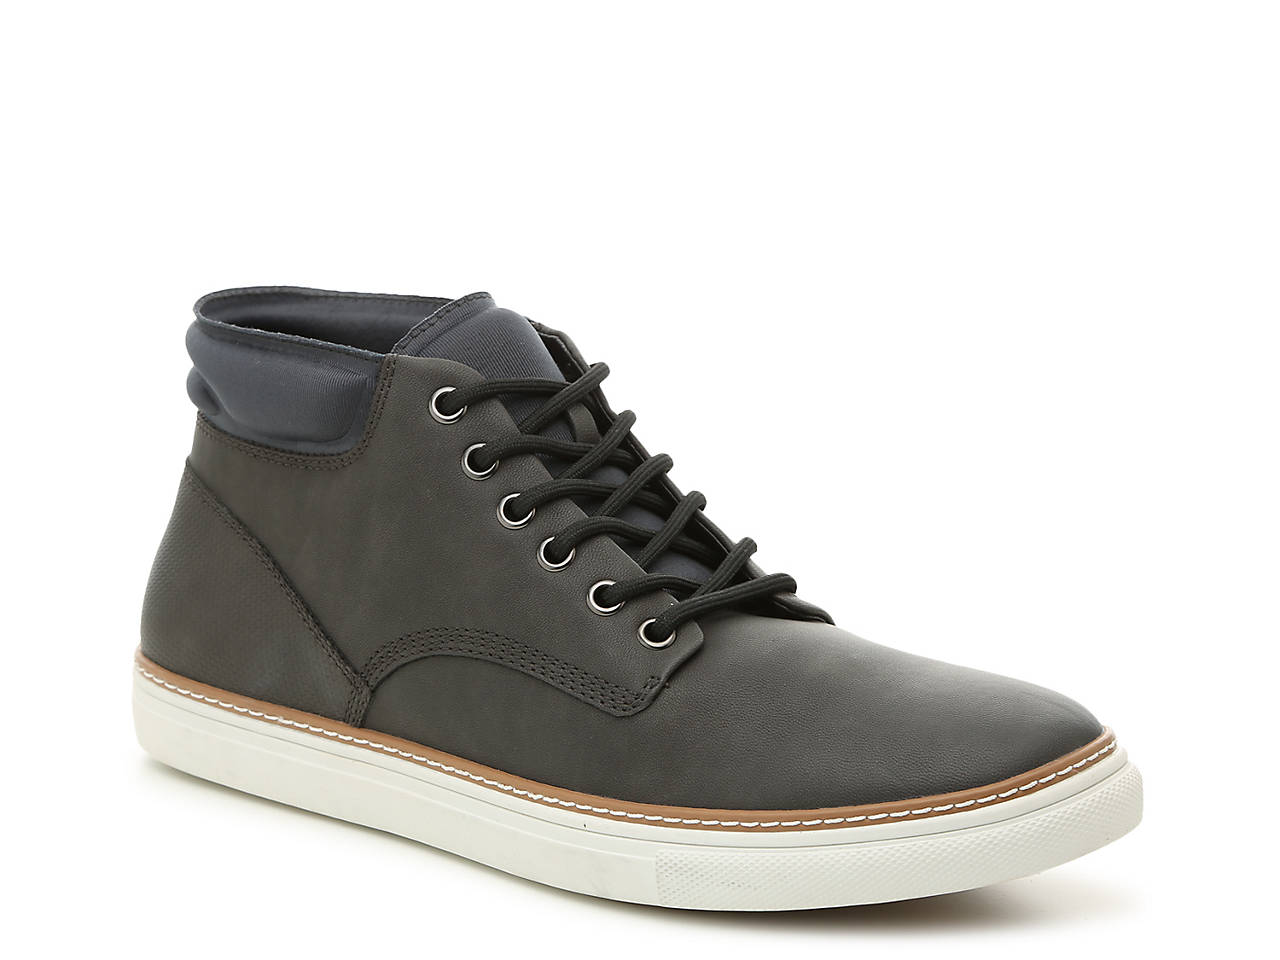 5d206e191da8 Seven 91 Larullan Mid-Top Sneaker Boot Men s Shoes